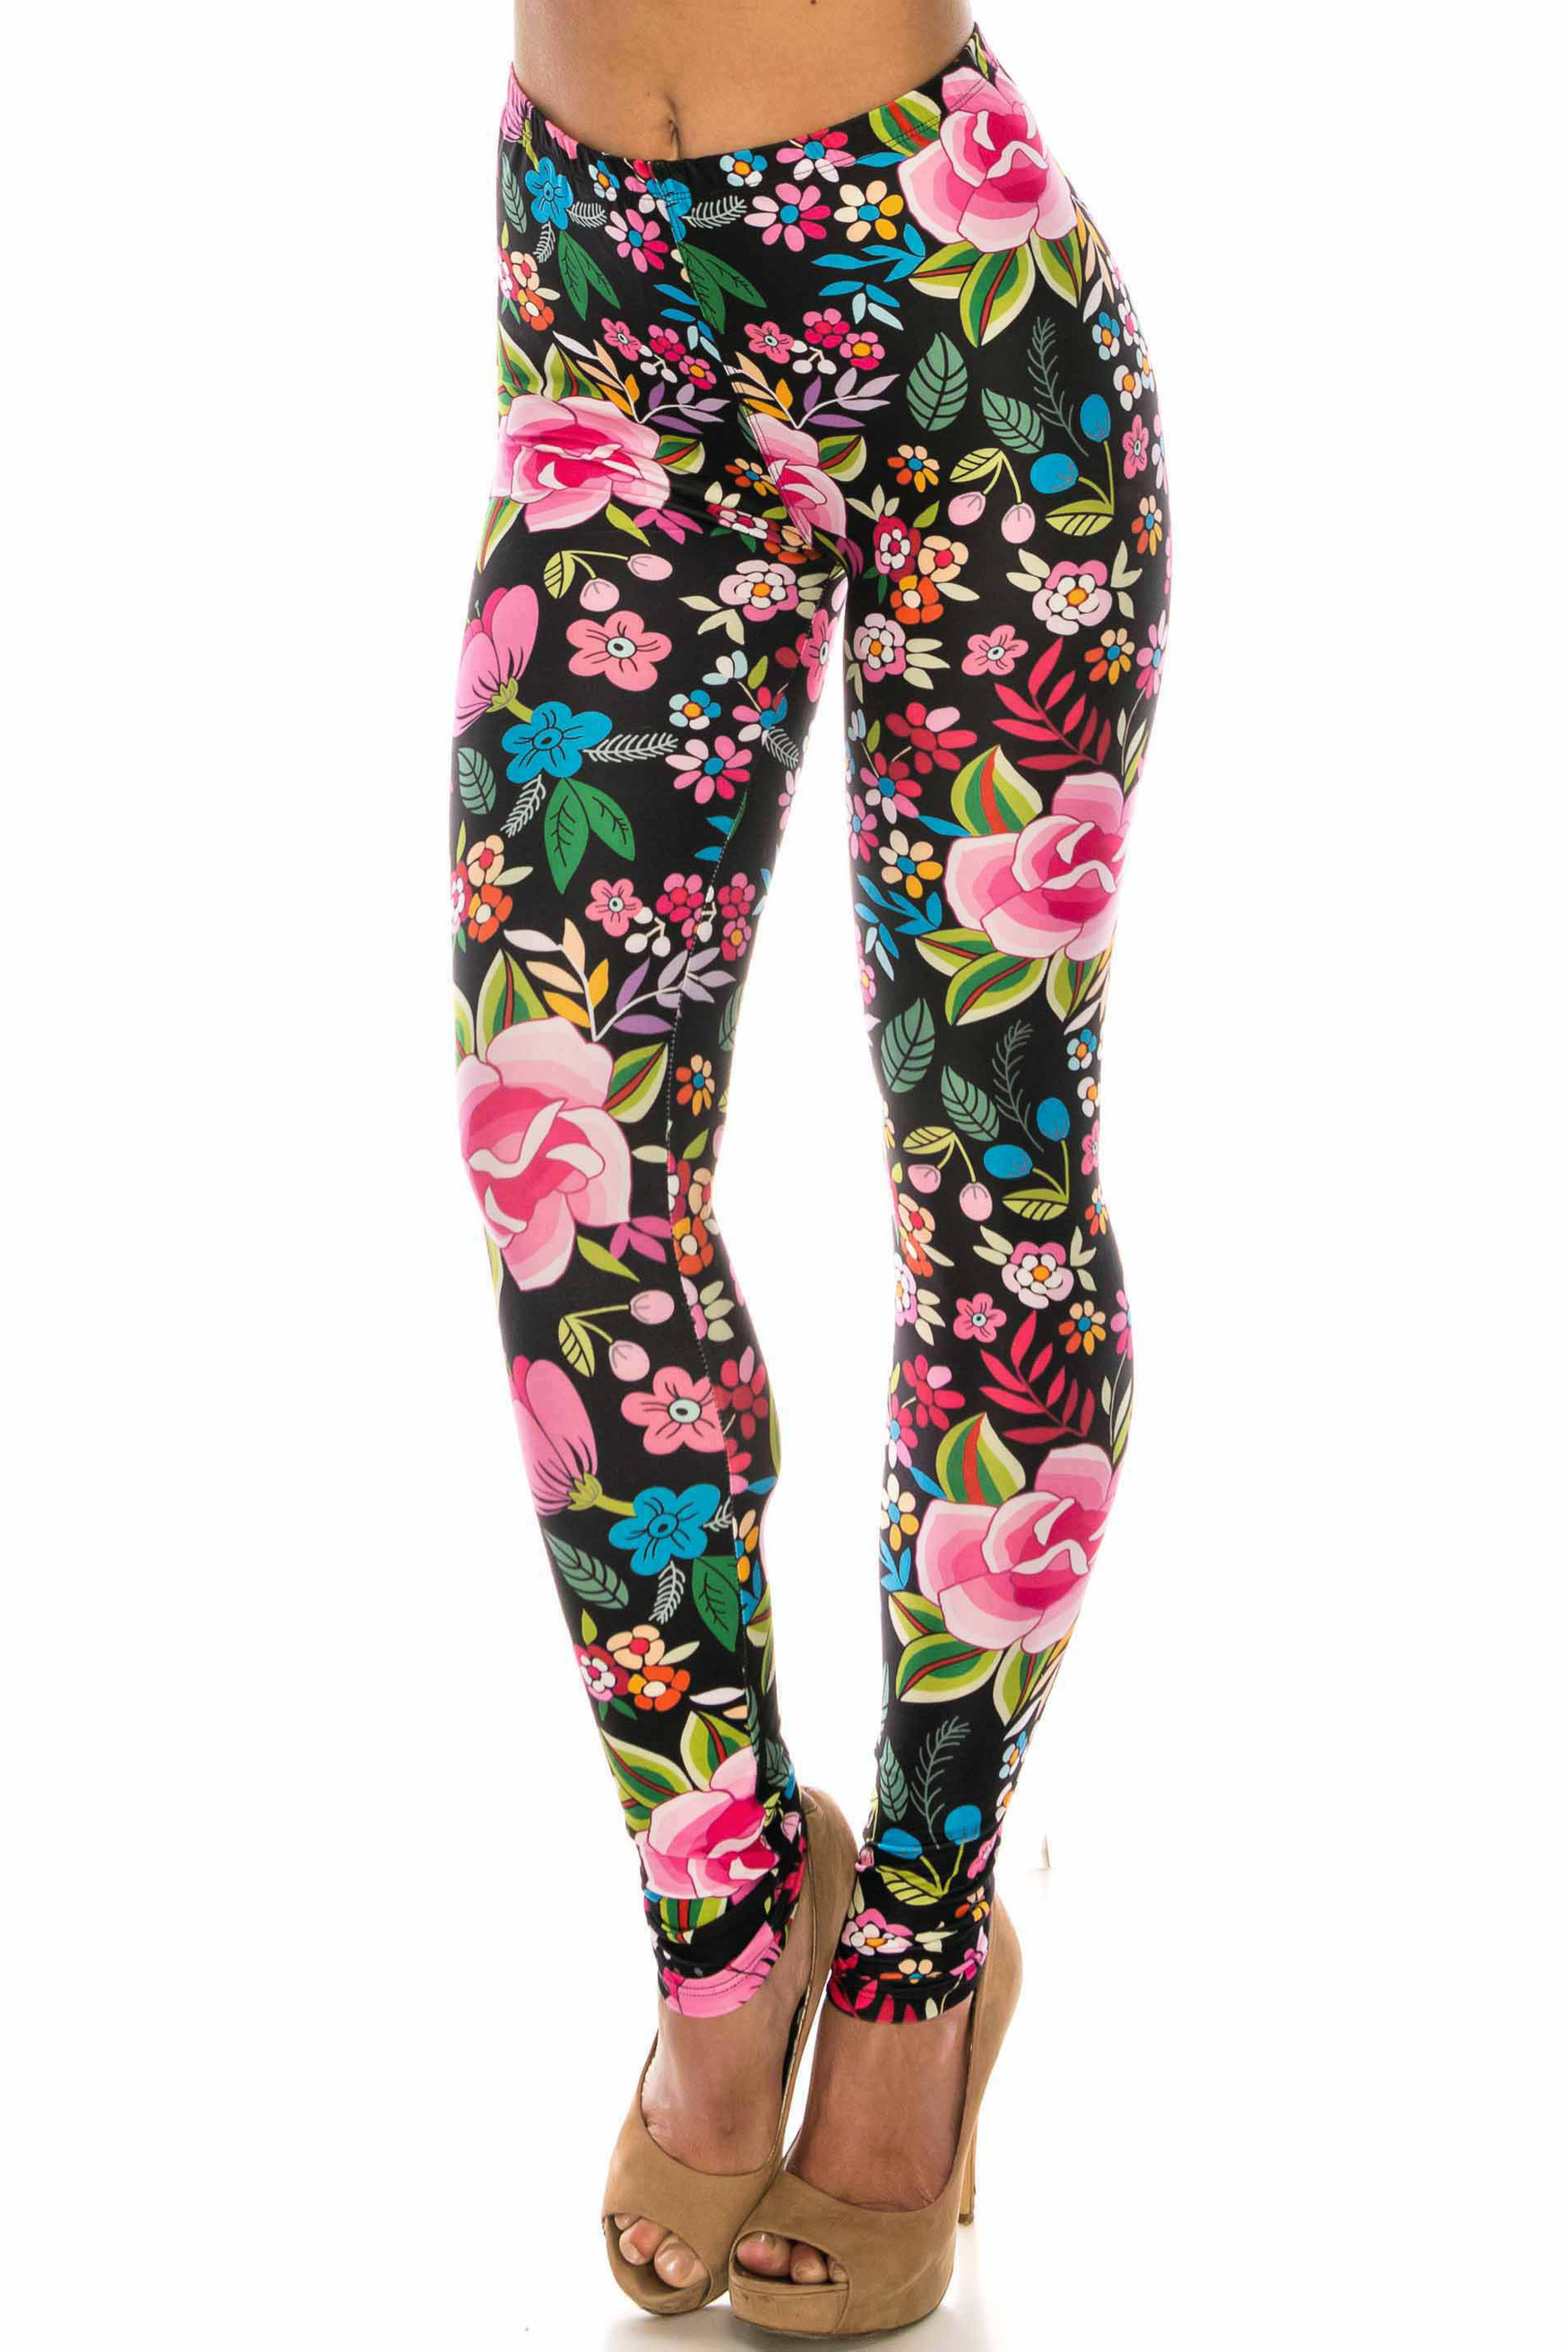 Creamy Soft Floral Oasis Extra Plus Size Leggings - 3X-5X - USA Fashion™